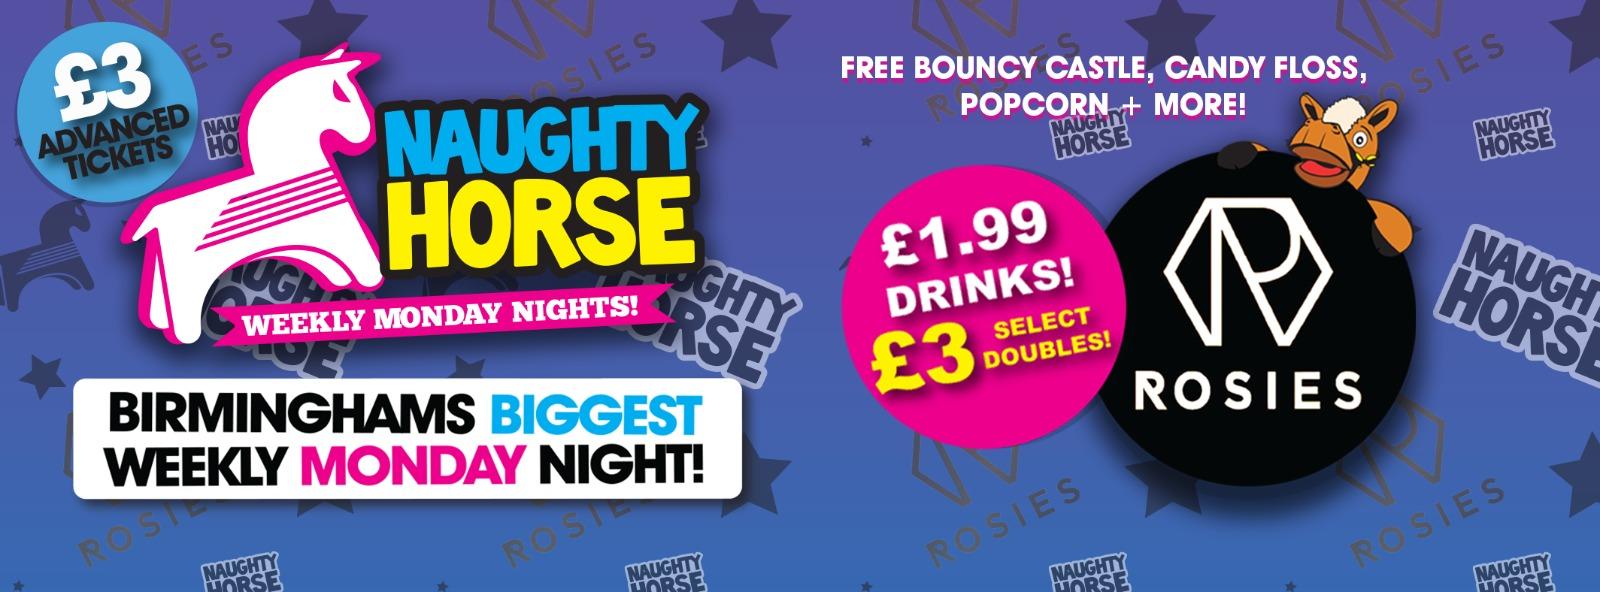 NAUGHTY HORSE at ROSIES! Birmingham's Biggest Weekly Monday Night!